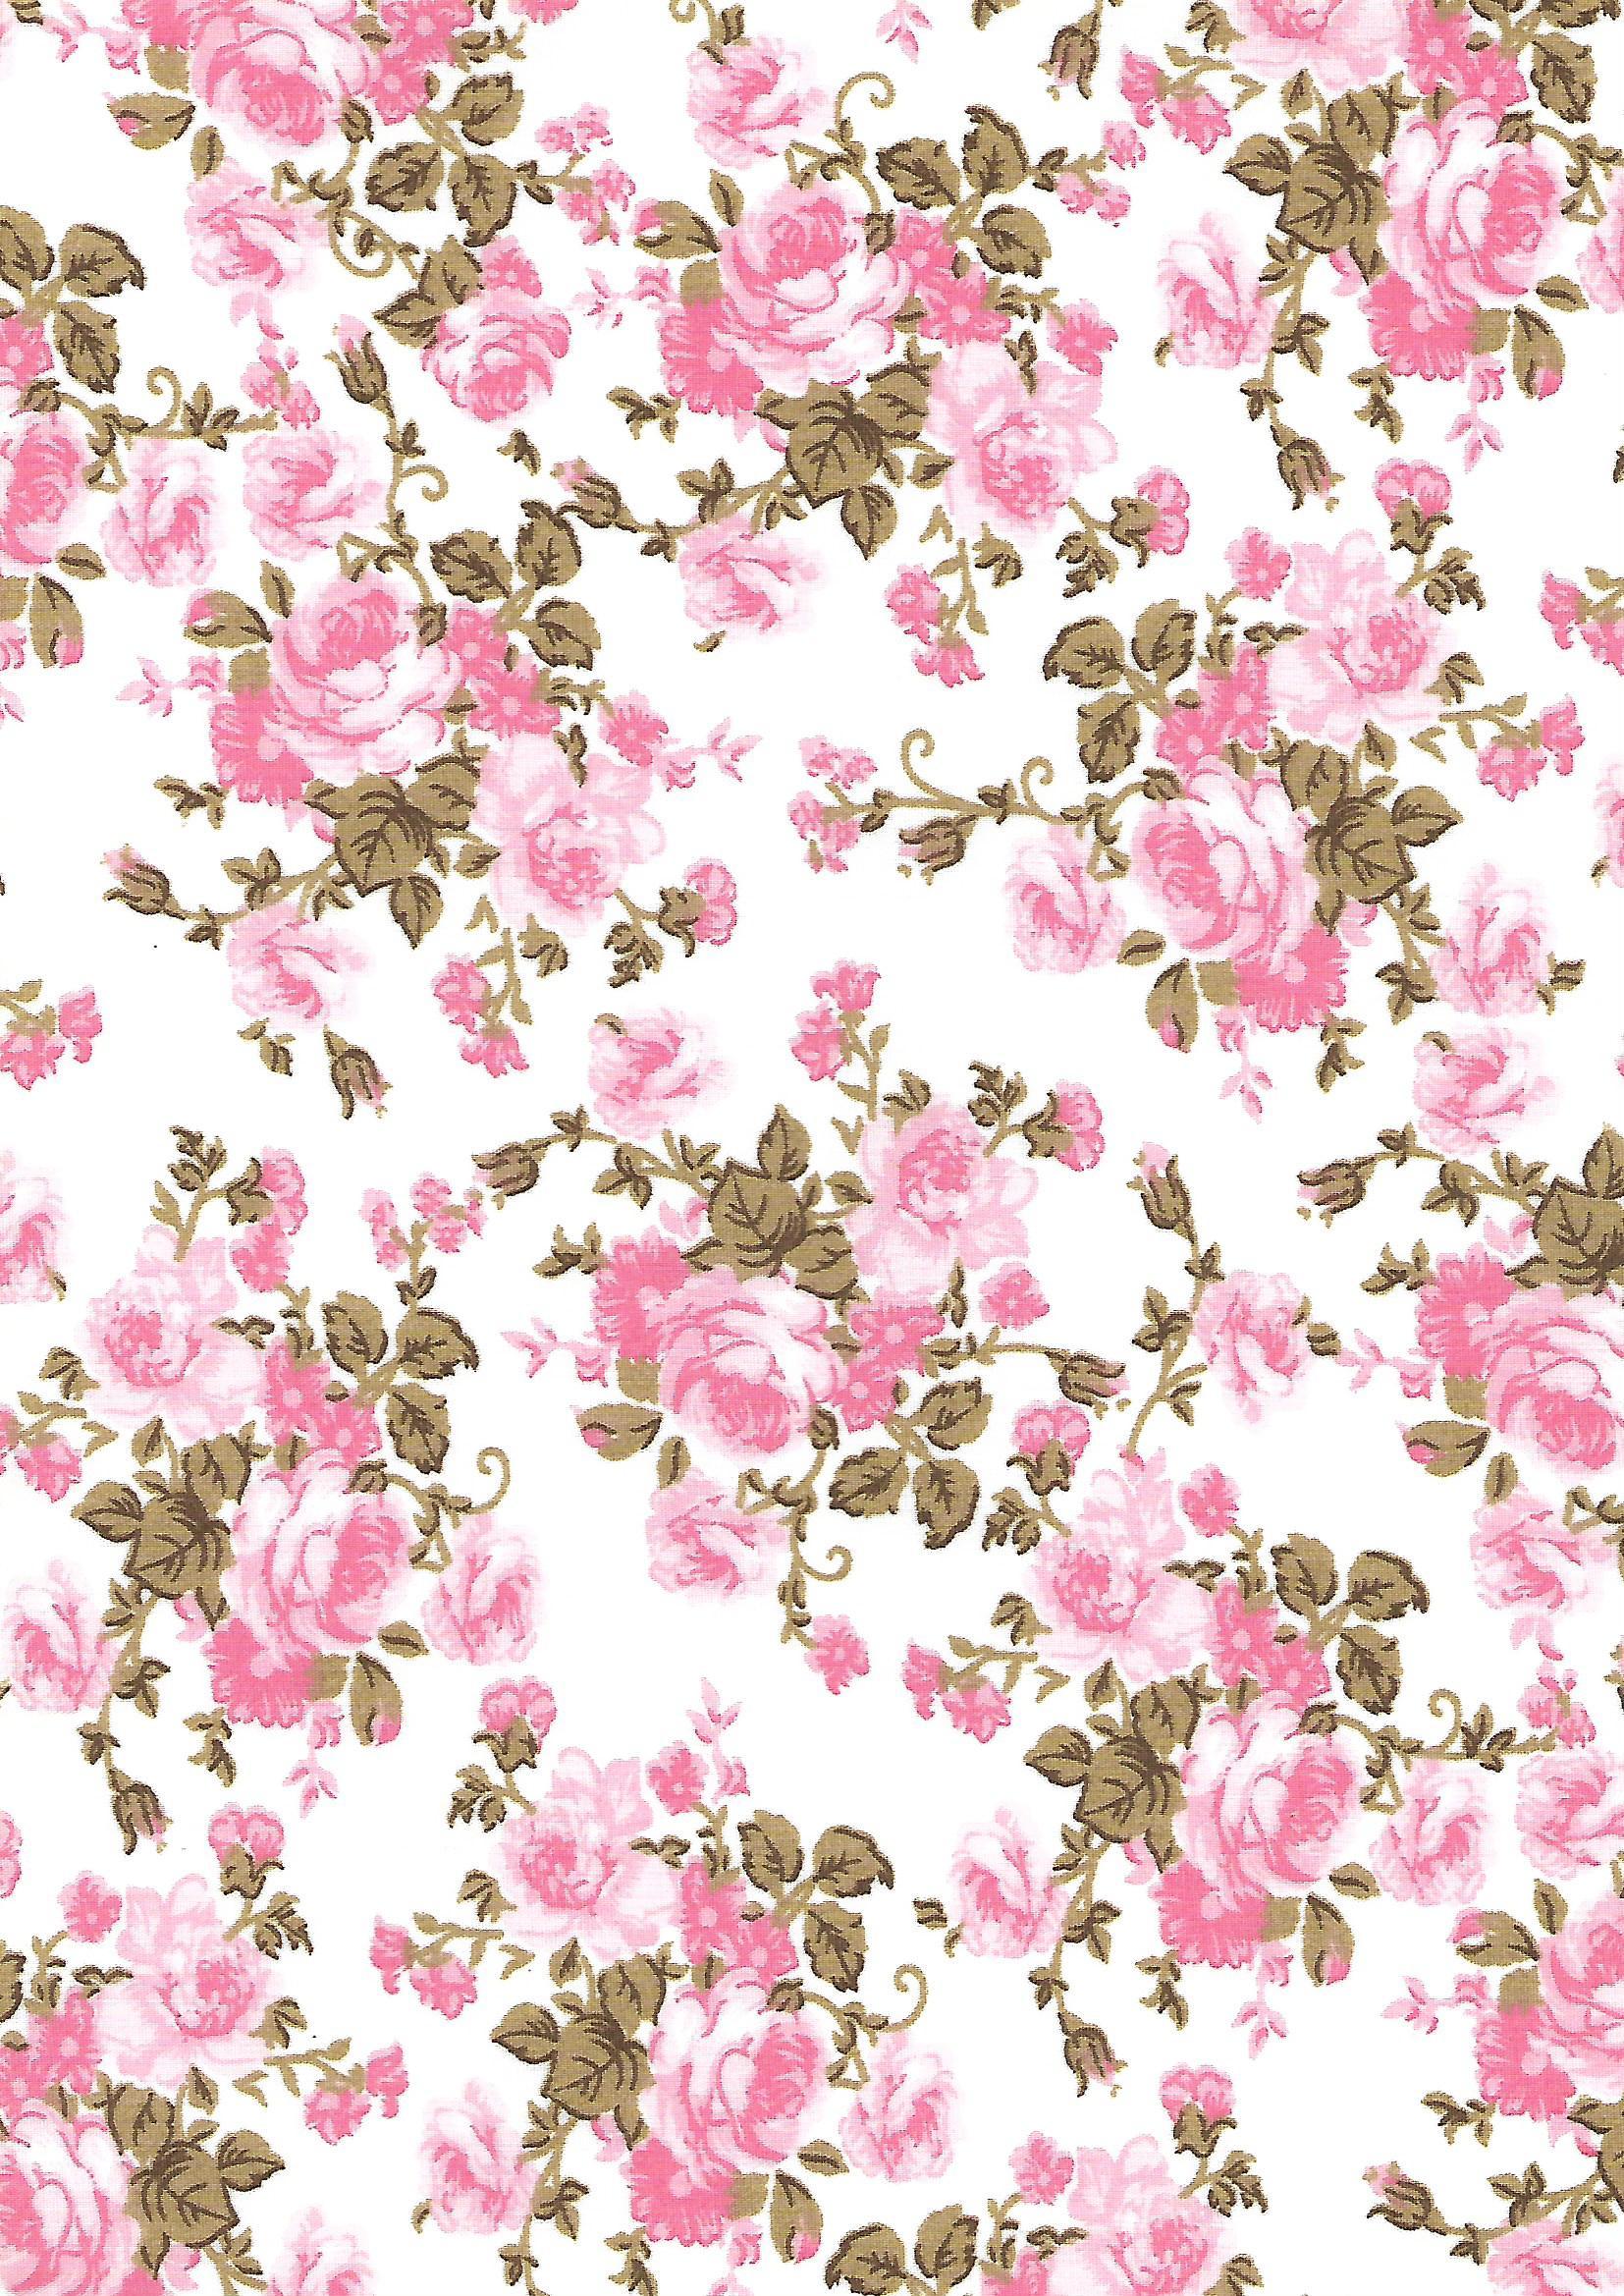 Floral Rosa Fundo Branco